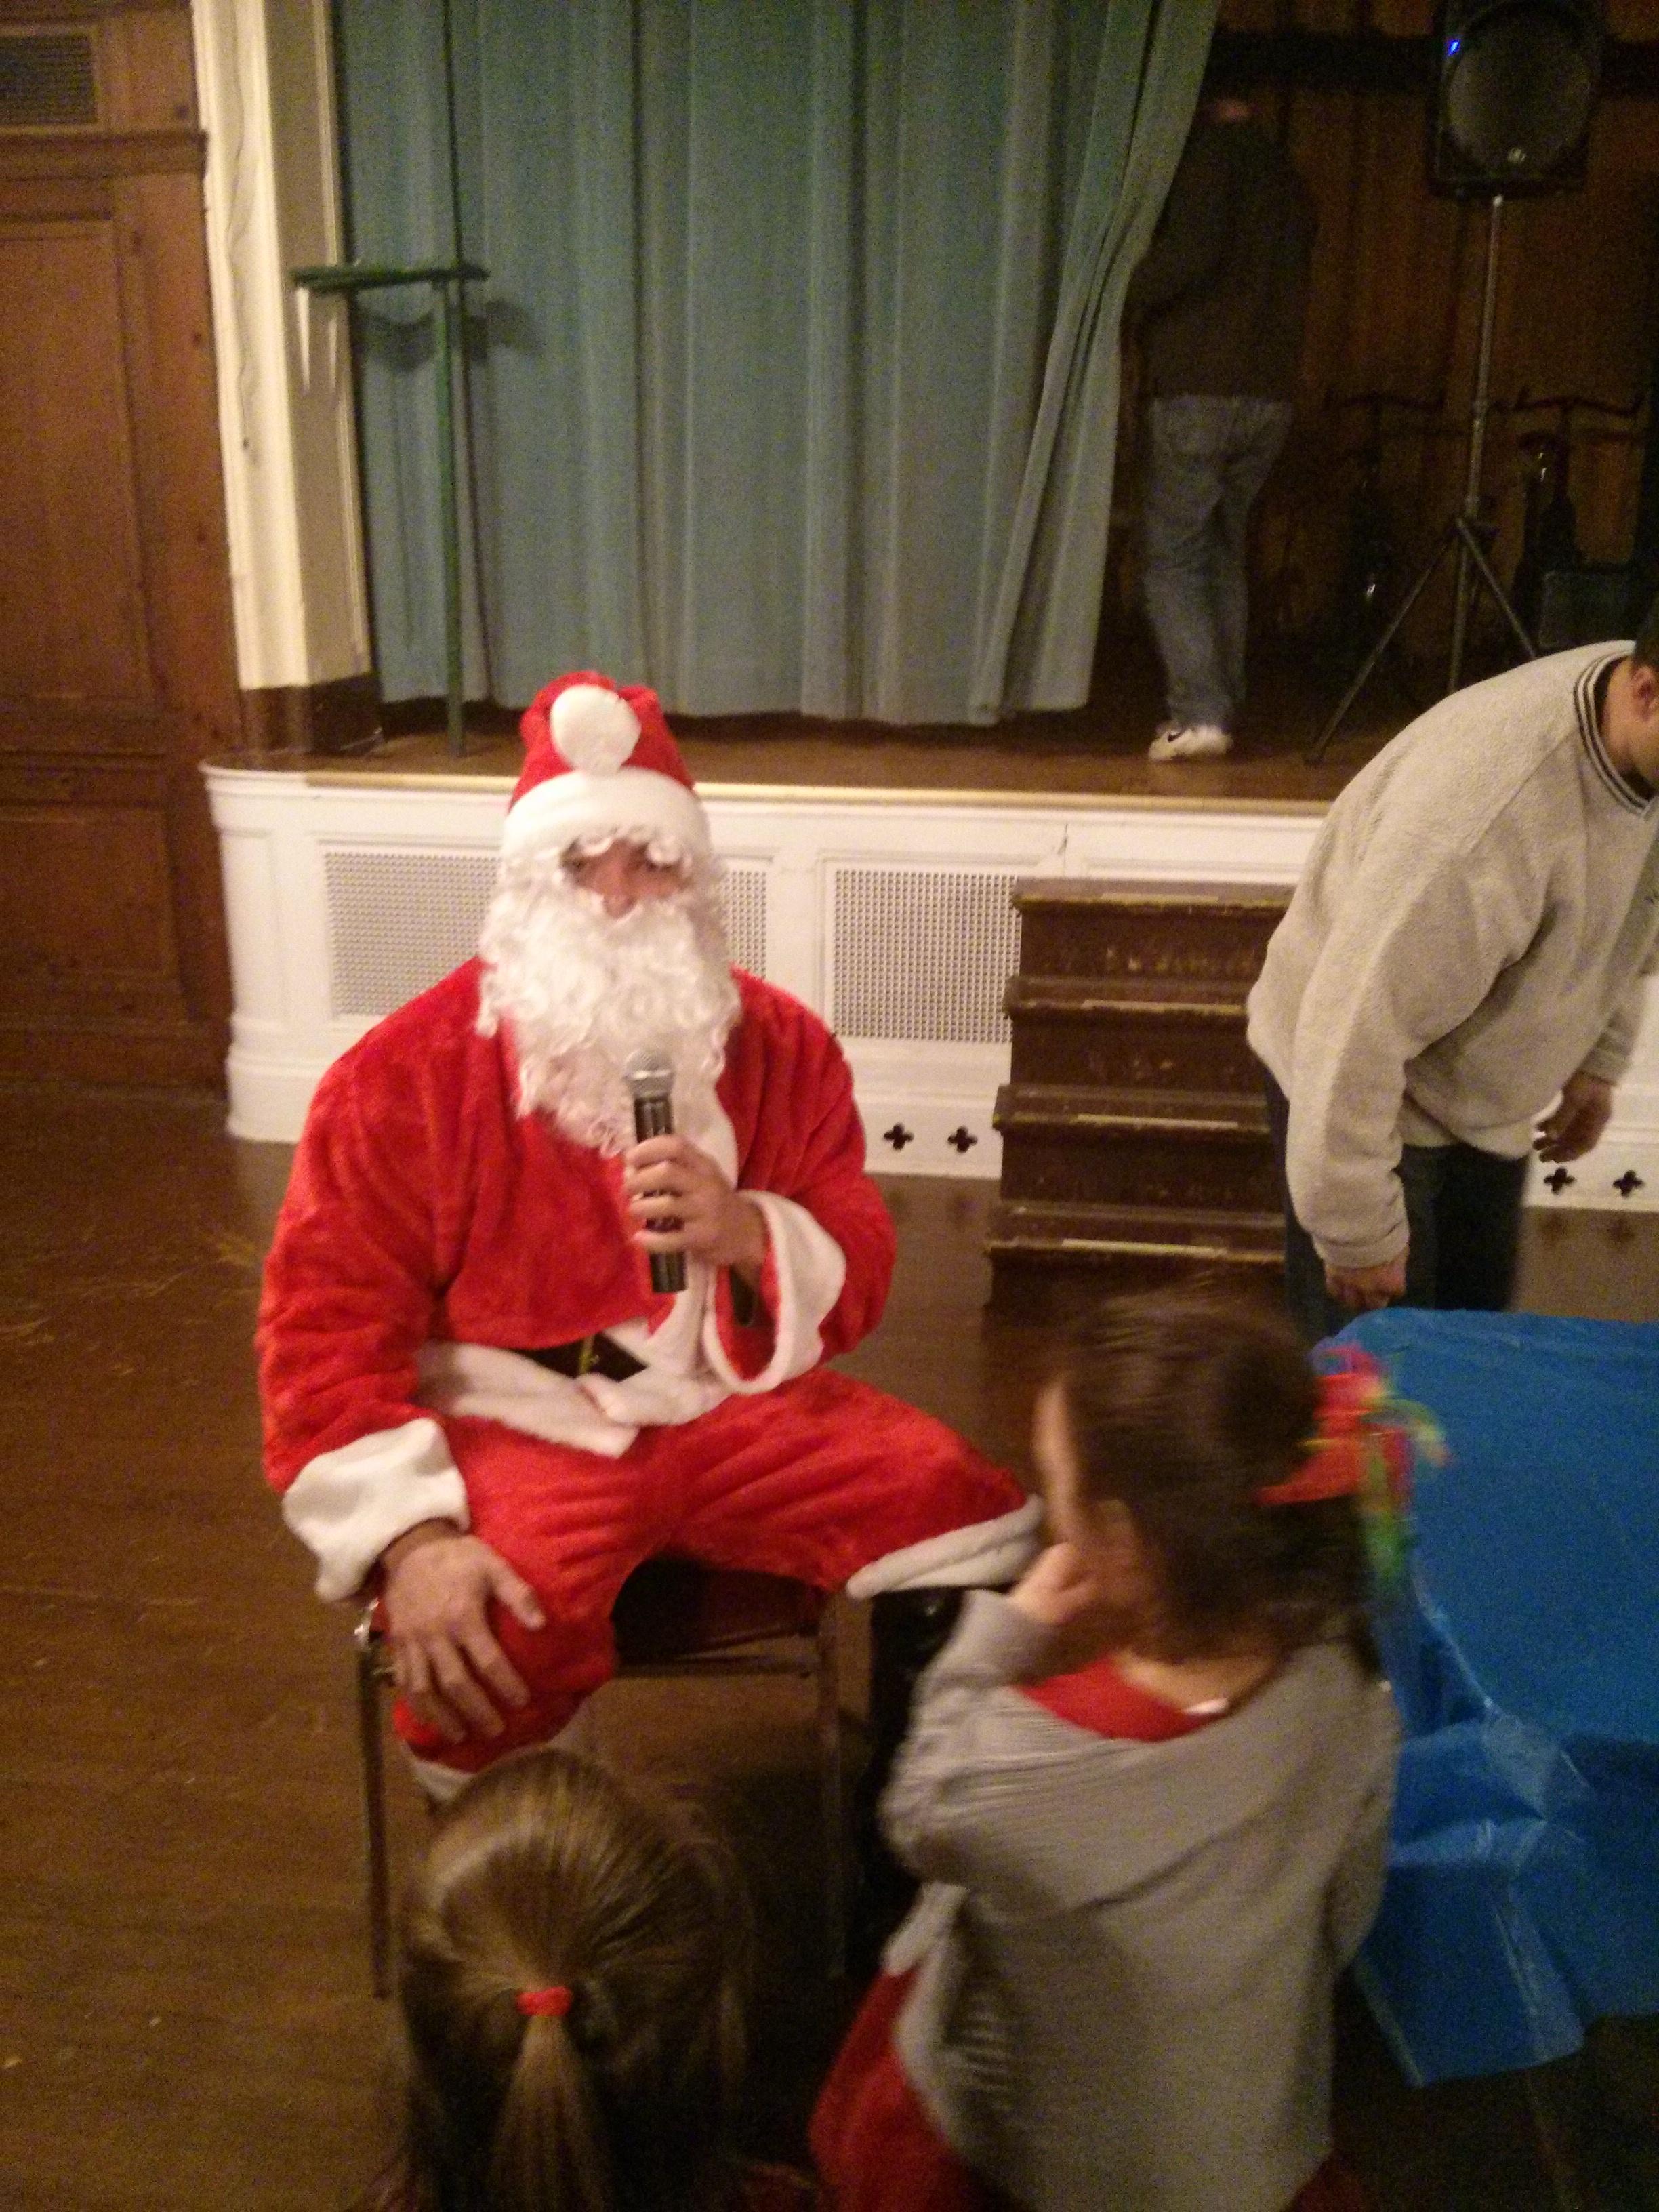 Played Santa